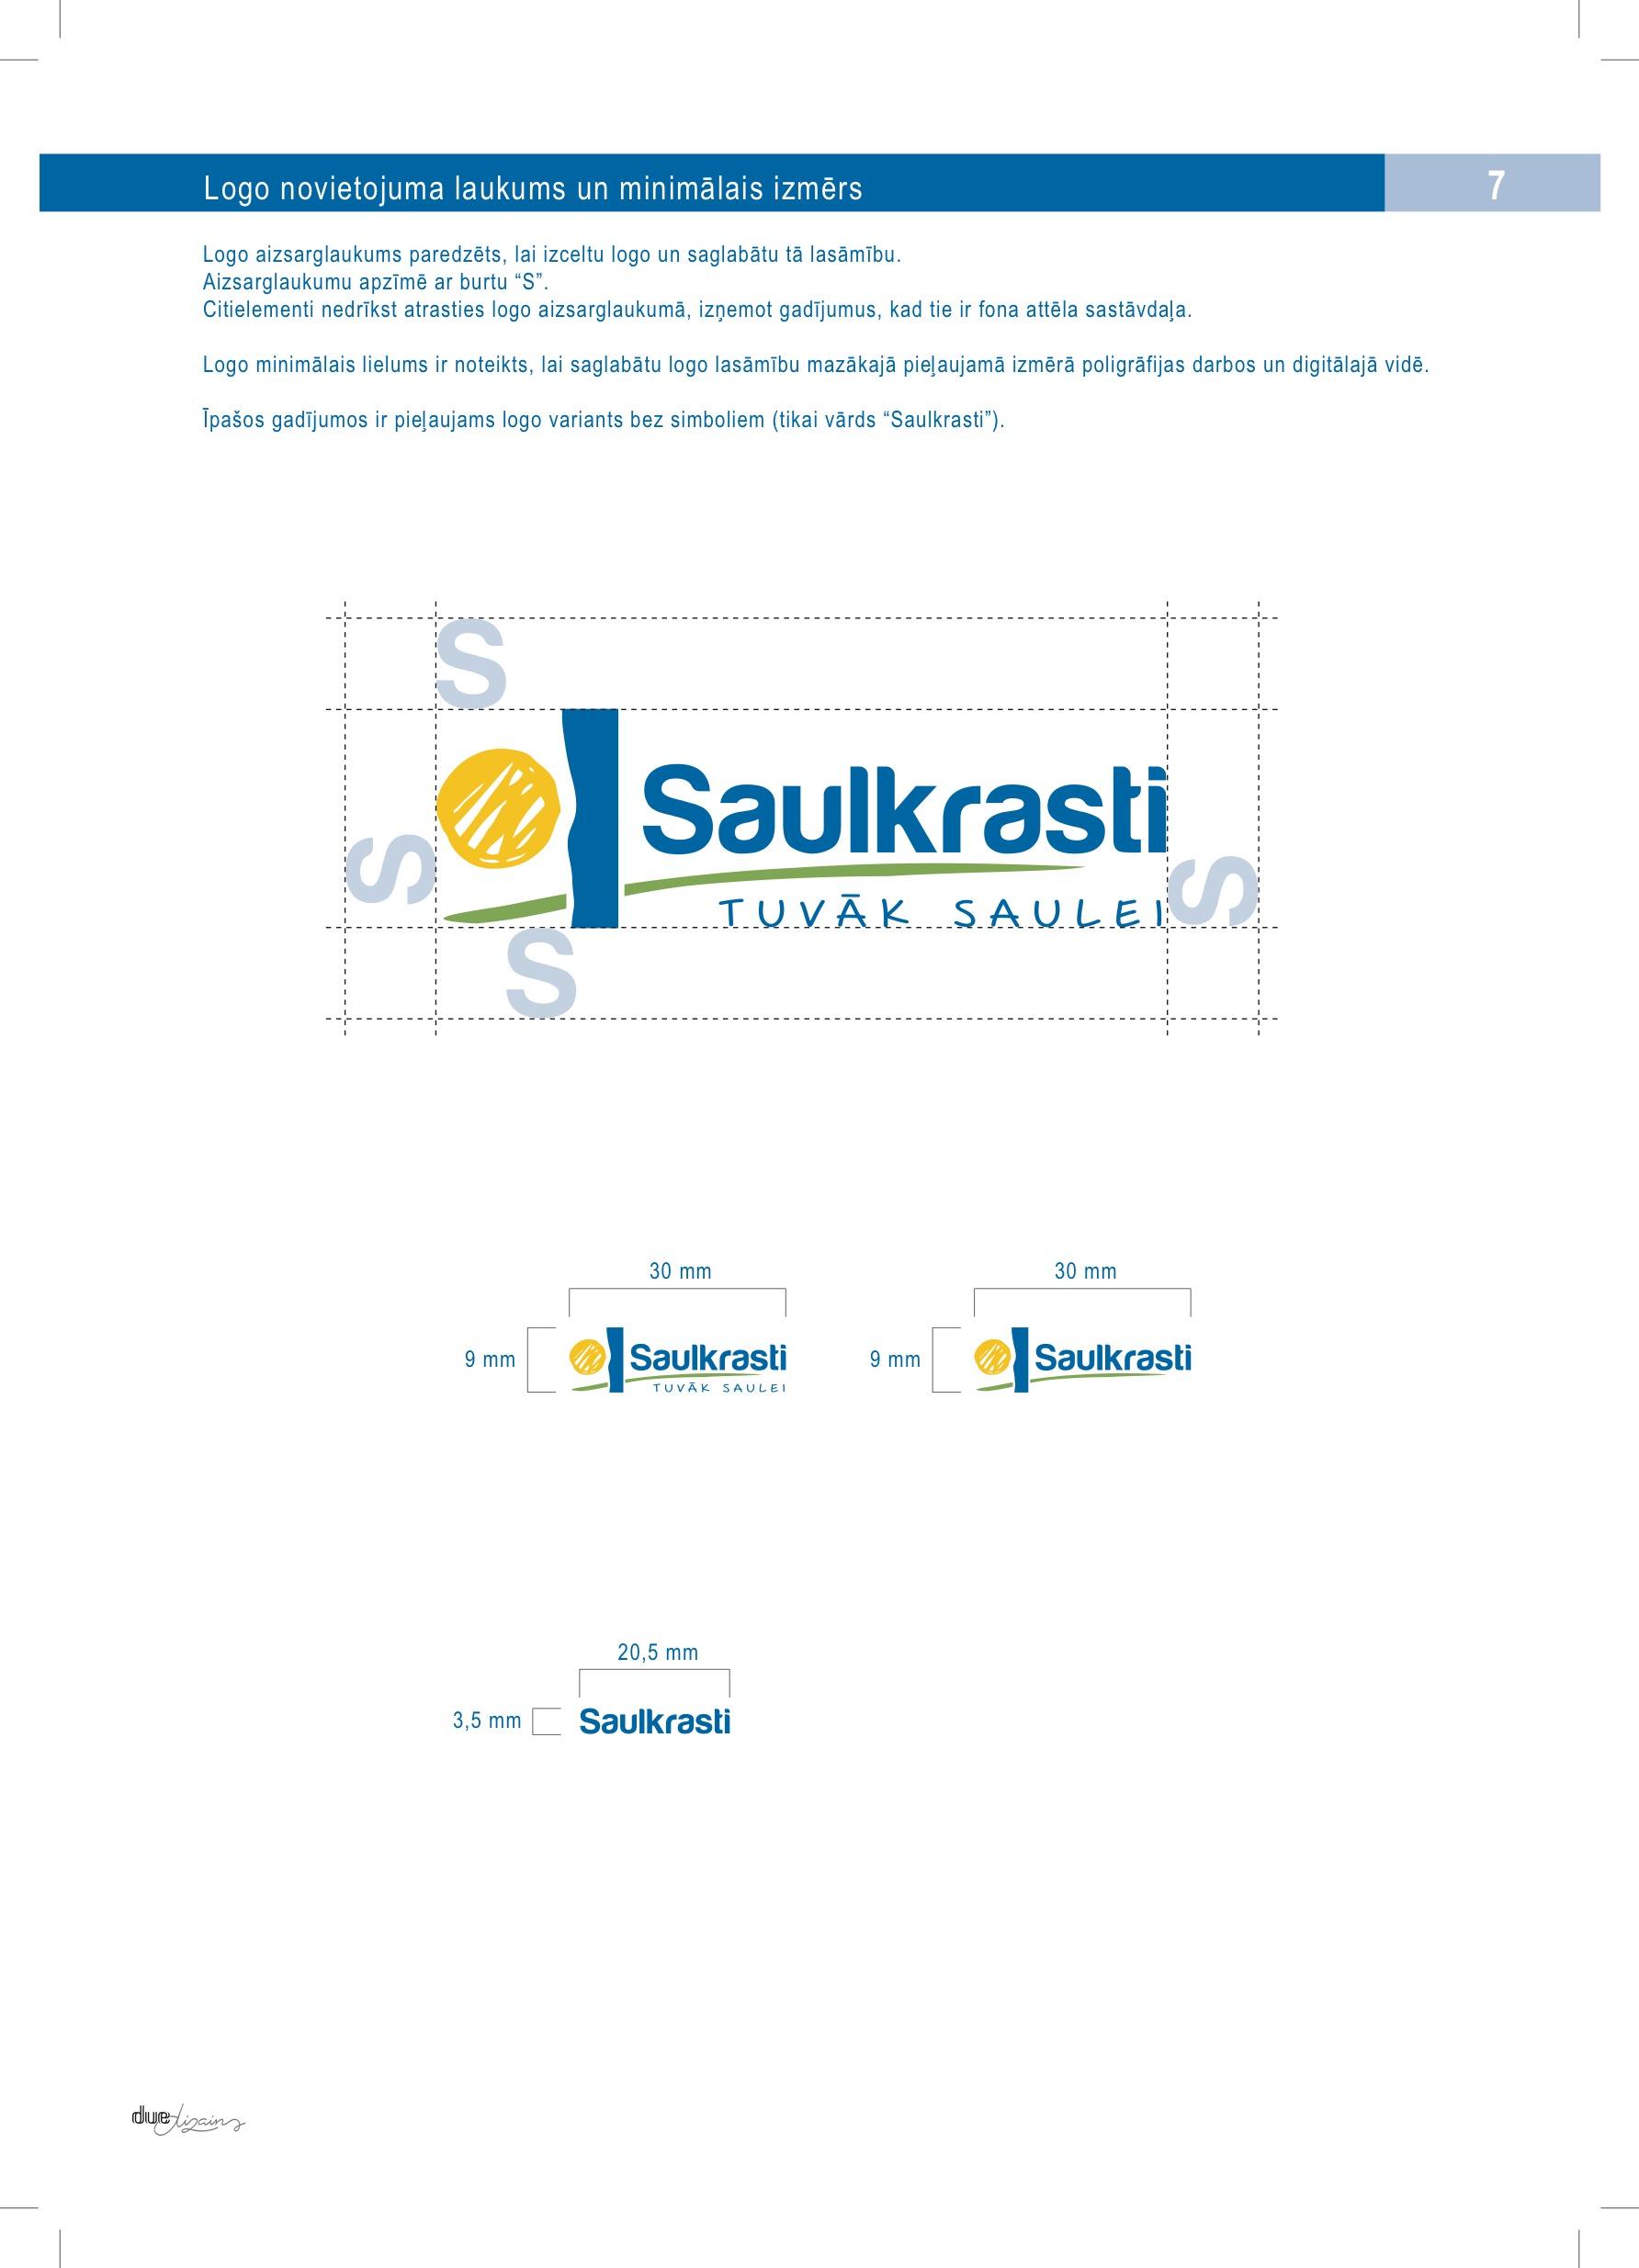 saulkrasti-print 9